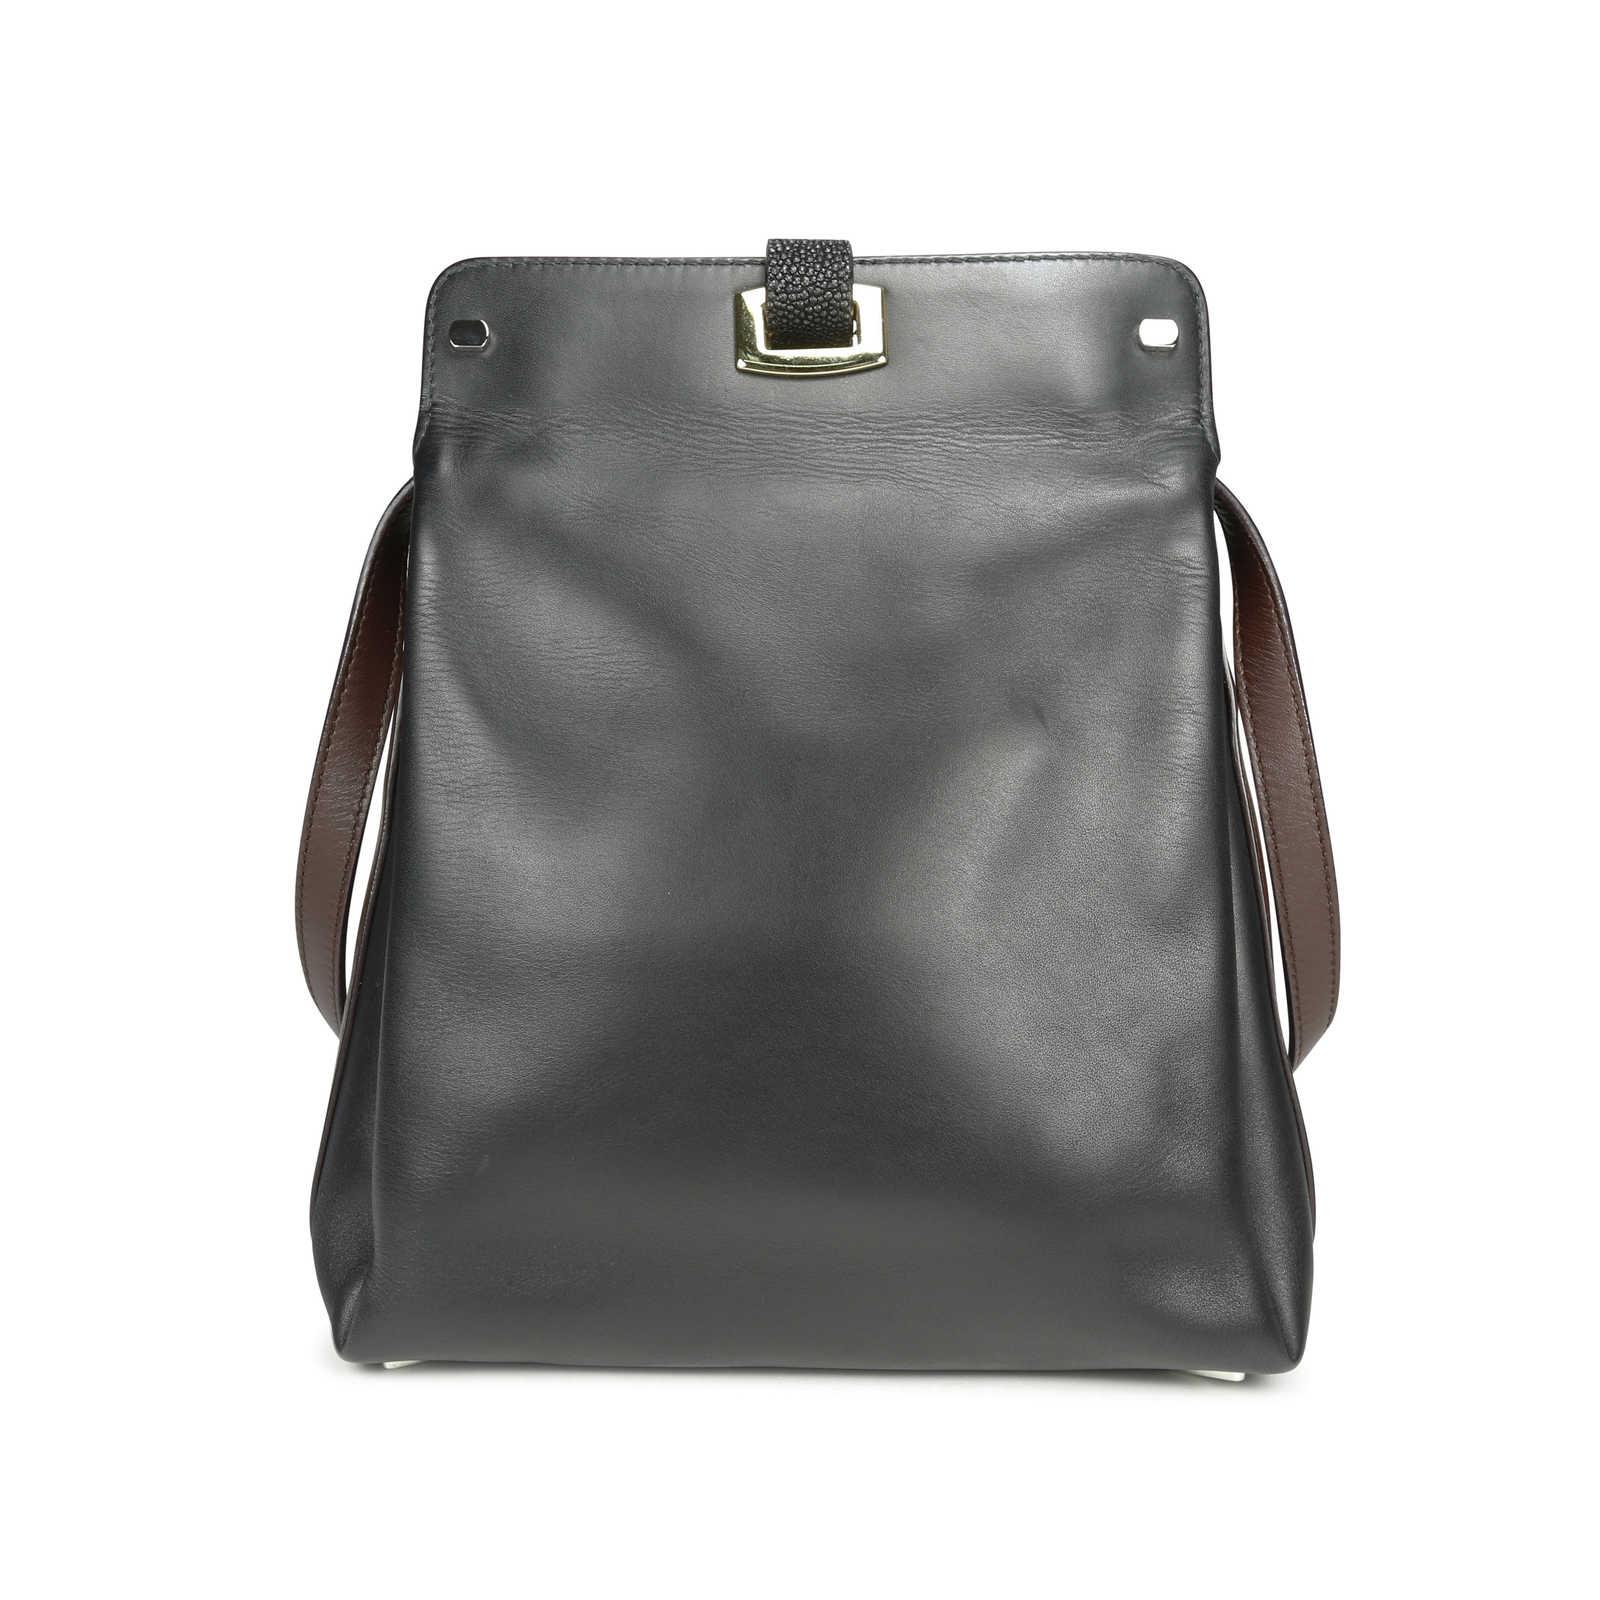 ... Authentic Second Hand Balenciaga 5-7 Stingray Bag (PSS-171-00037) ... cd2d04ab74c2a